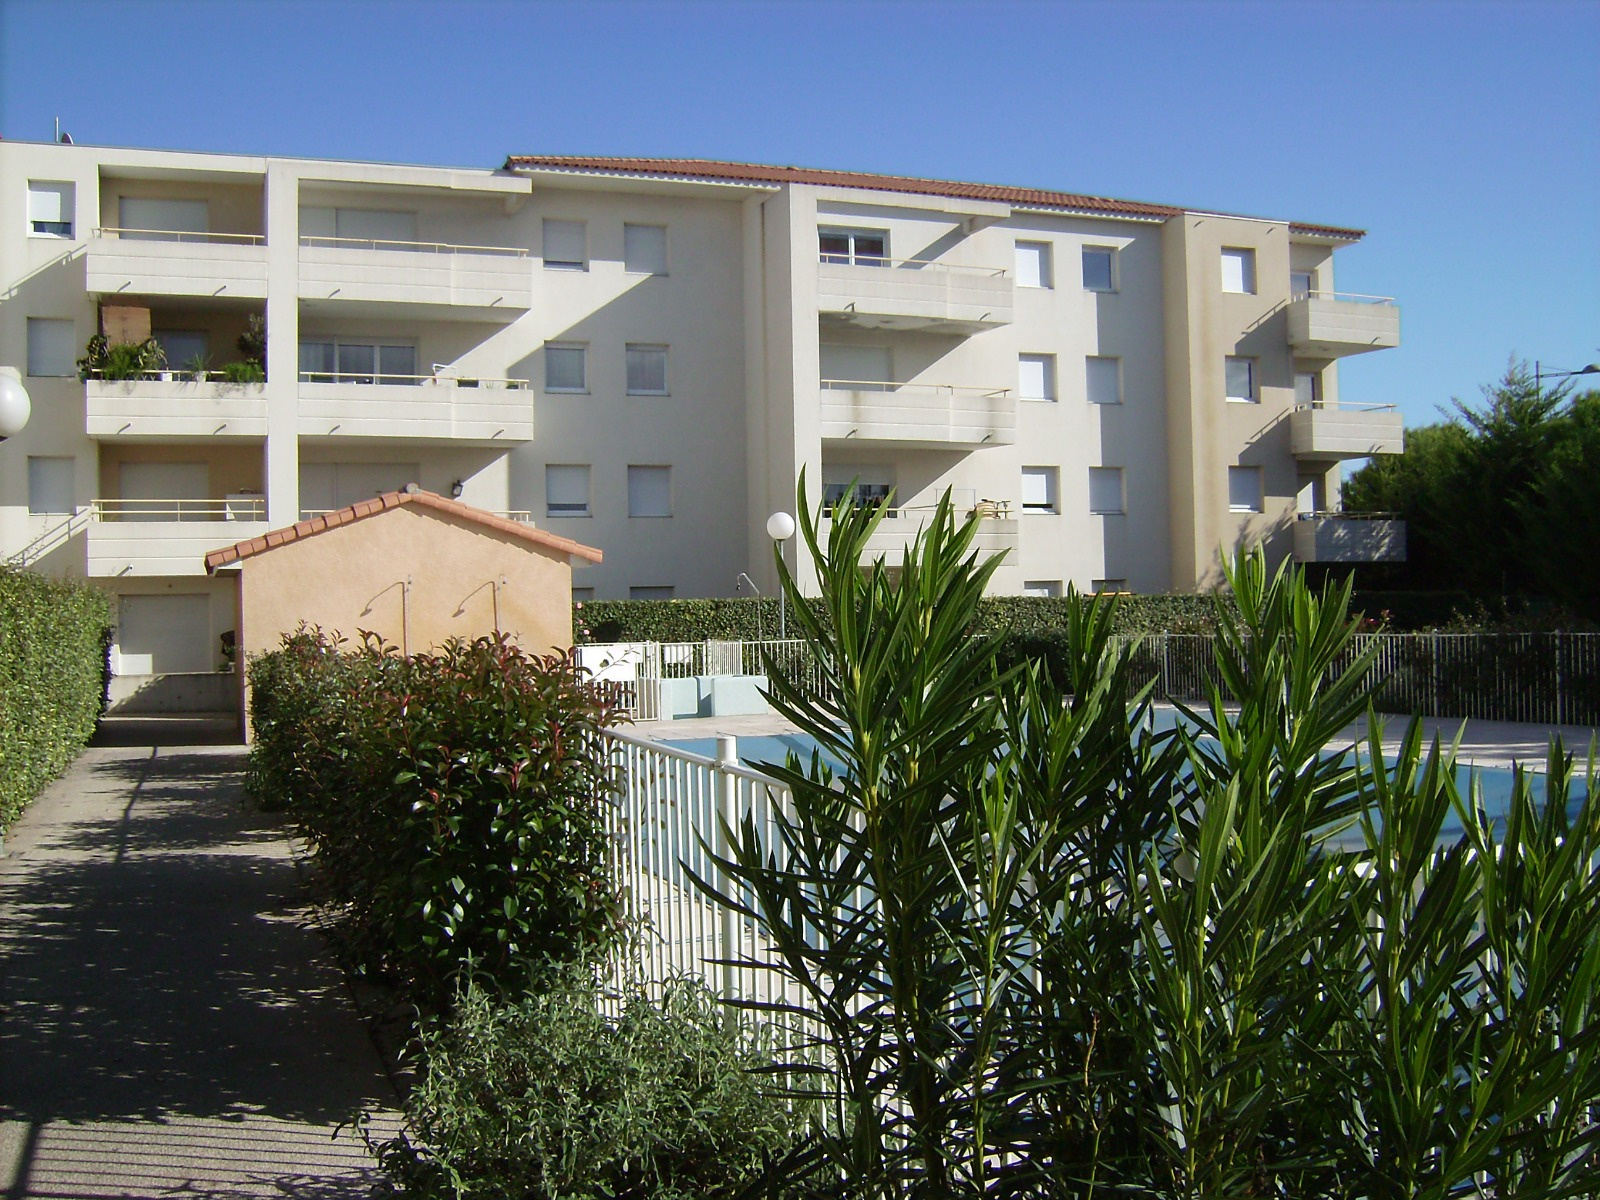 Location Montpellier T2 Meuble Dans Une Residence Avec